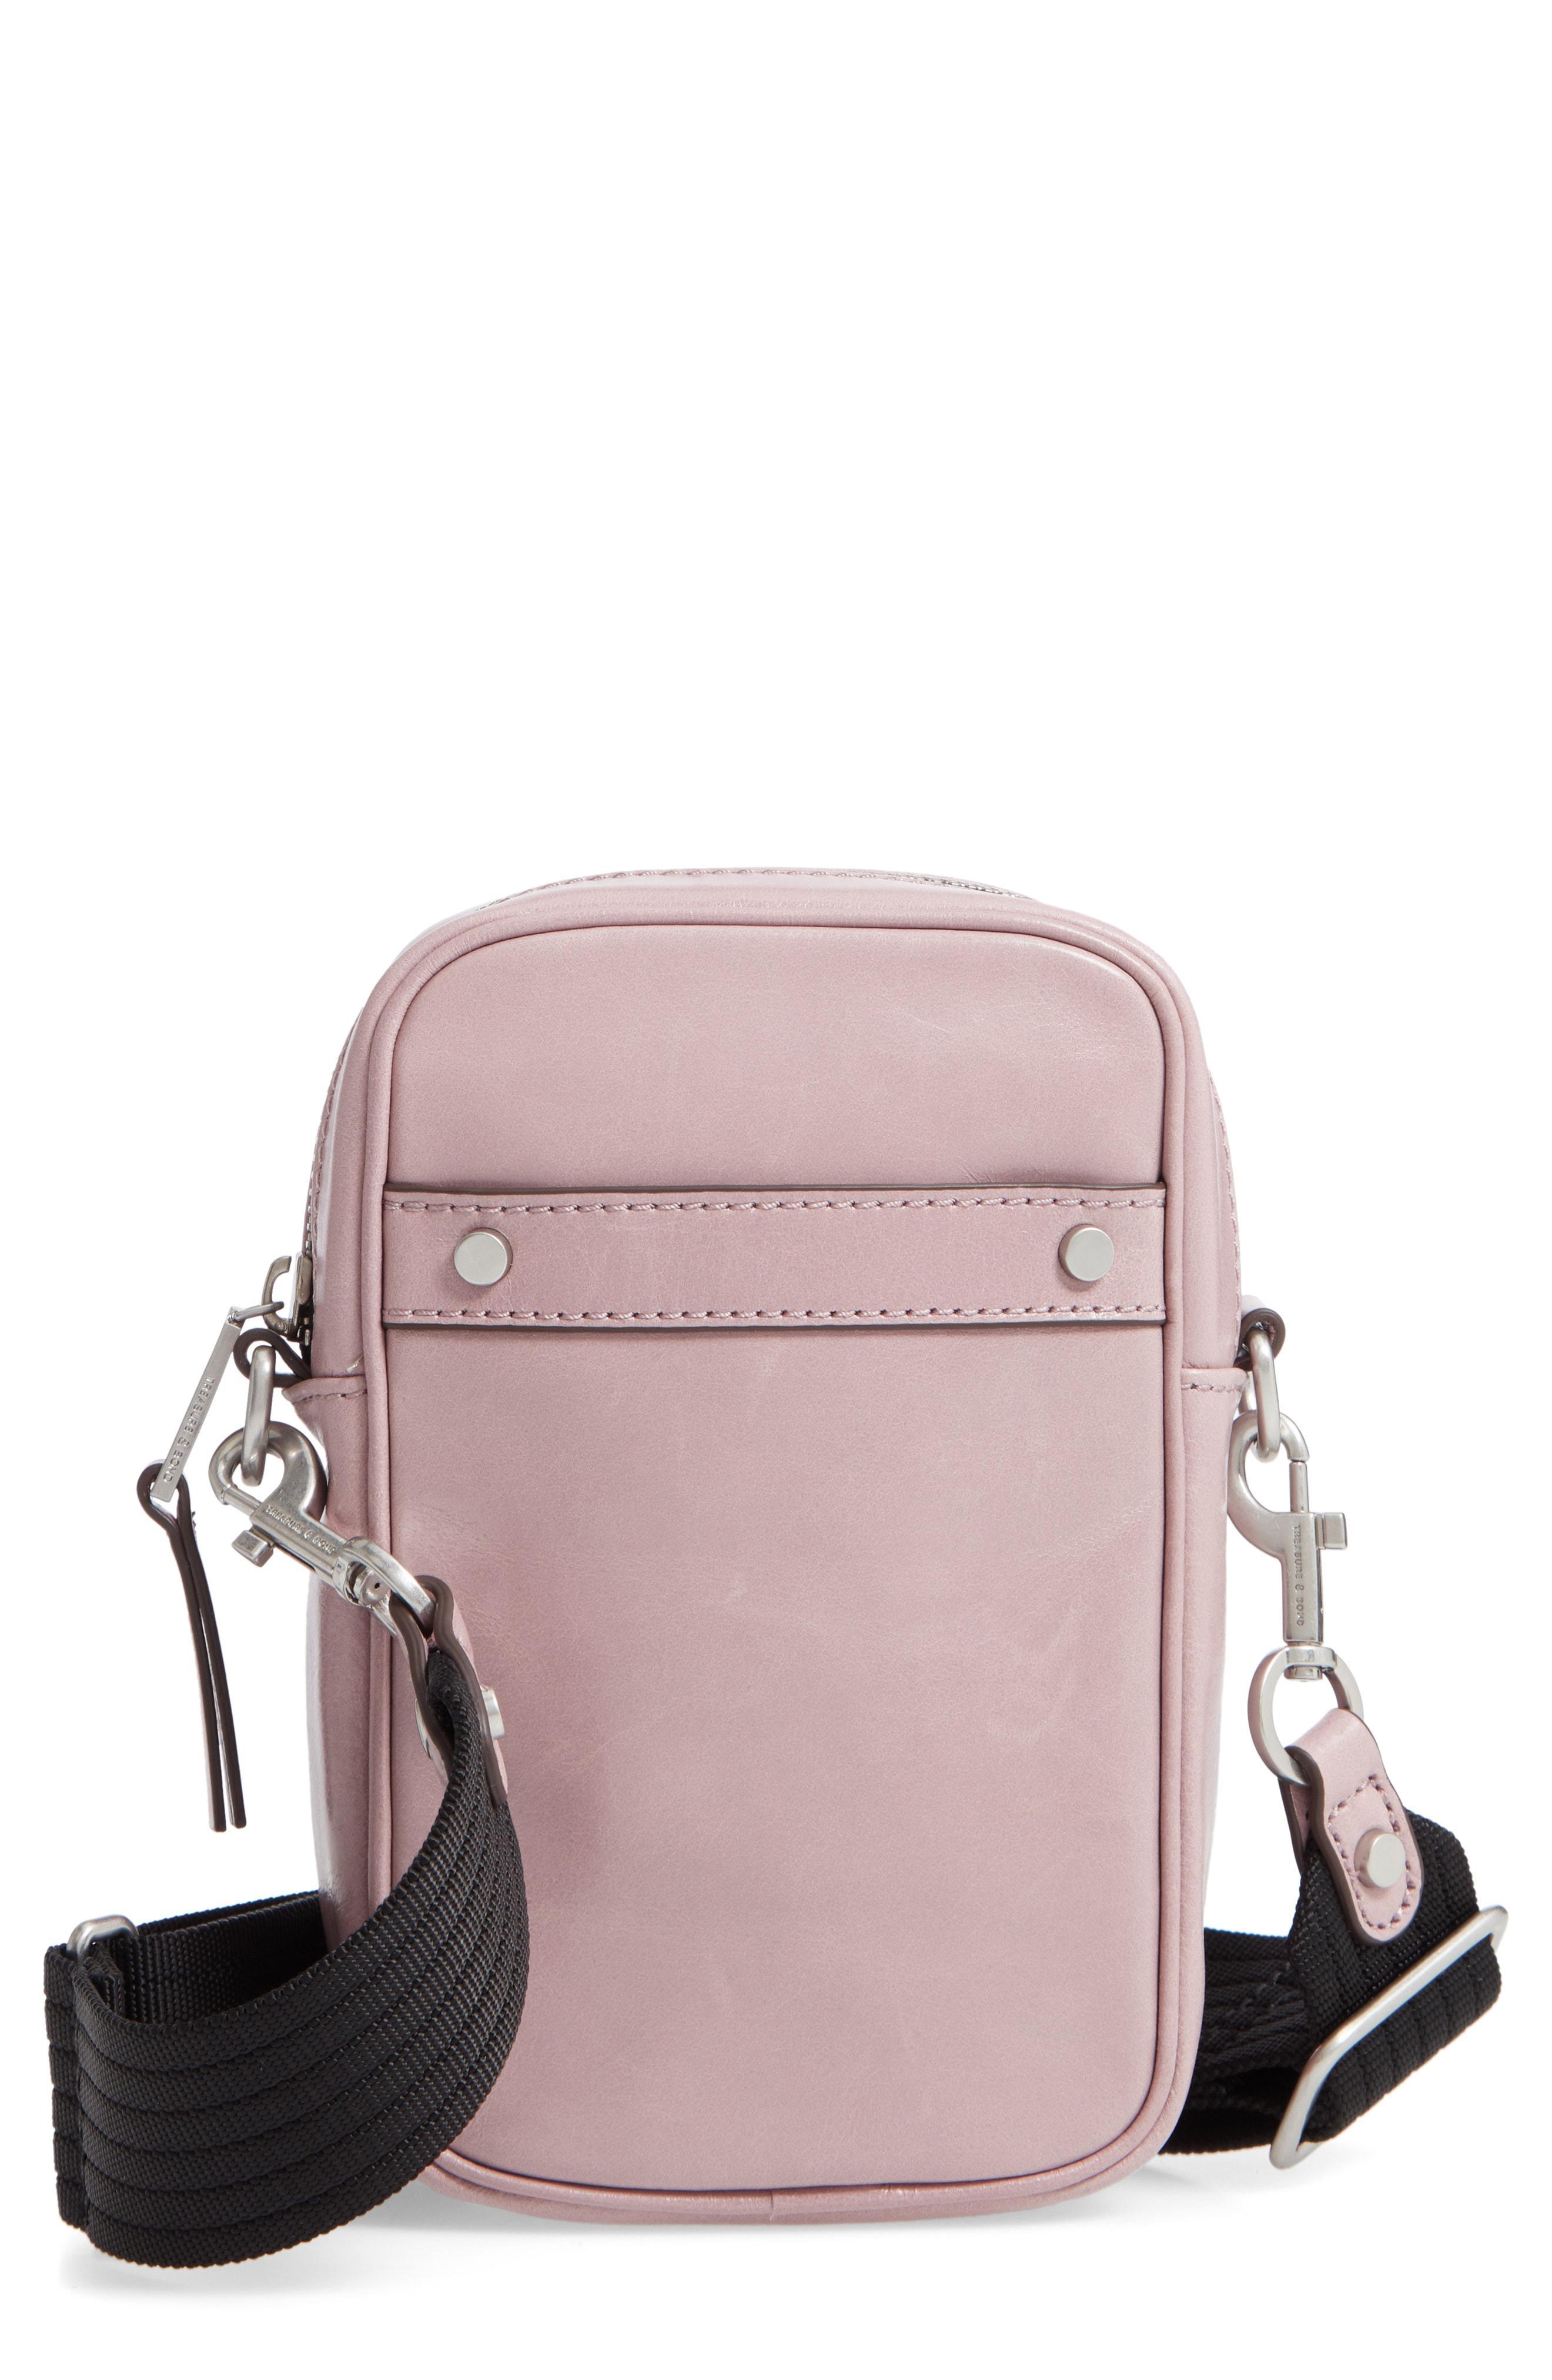 42e5316090c3 Lyst - Treasure & Bond Murphy Glazed Leather Crossbody Bag - Purple ...